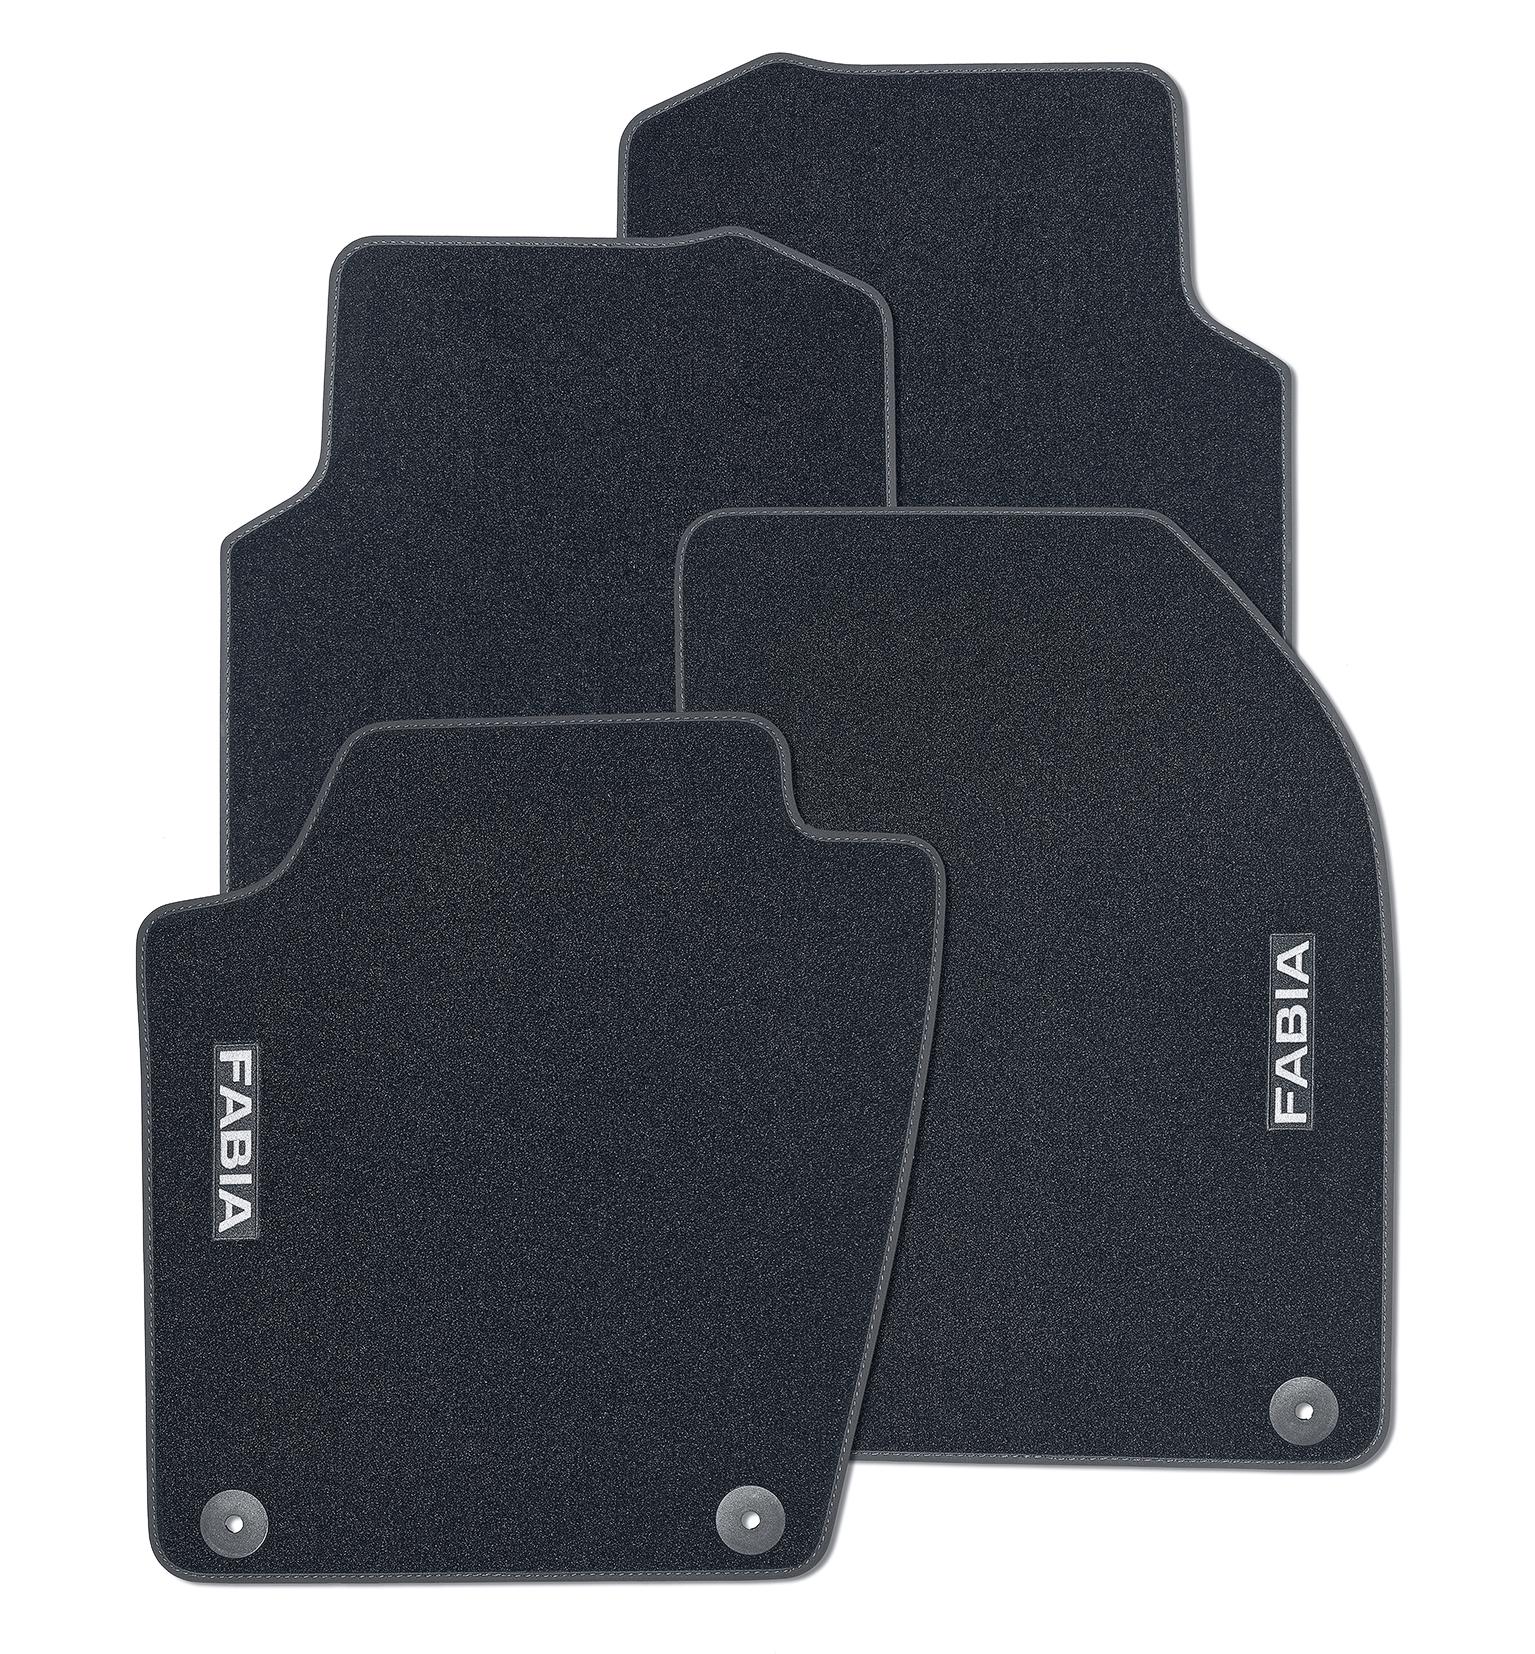 Textilfußmatten-Set Standard FABIA III